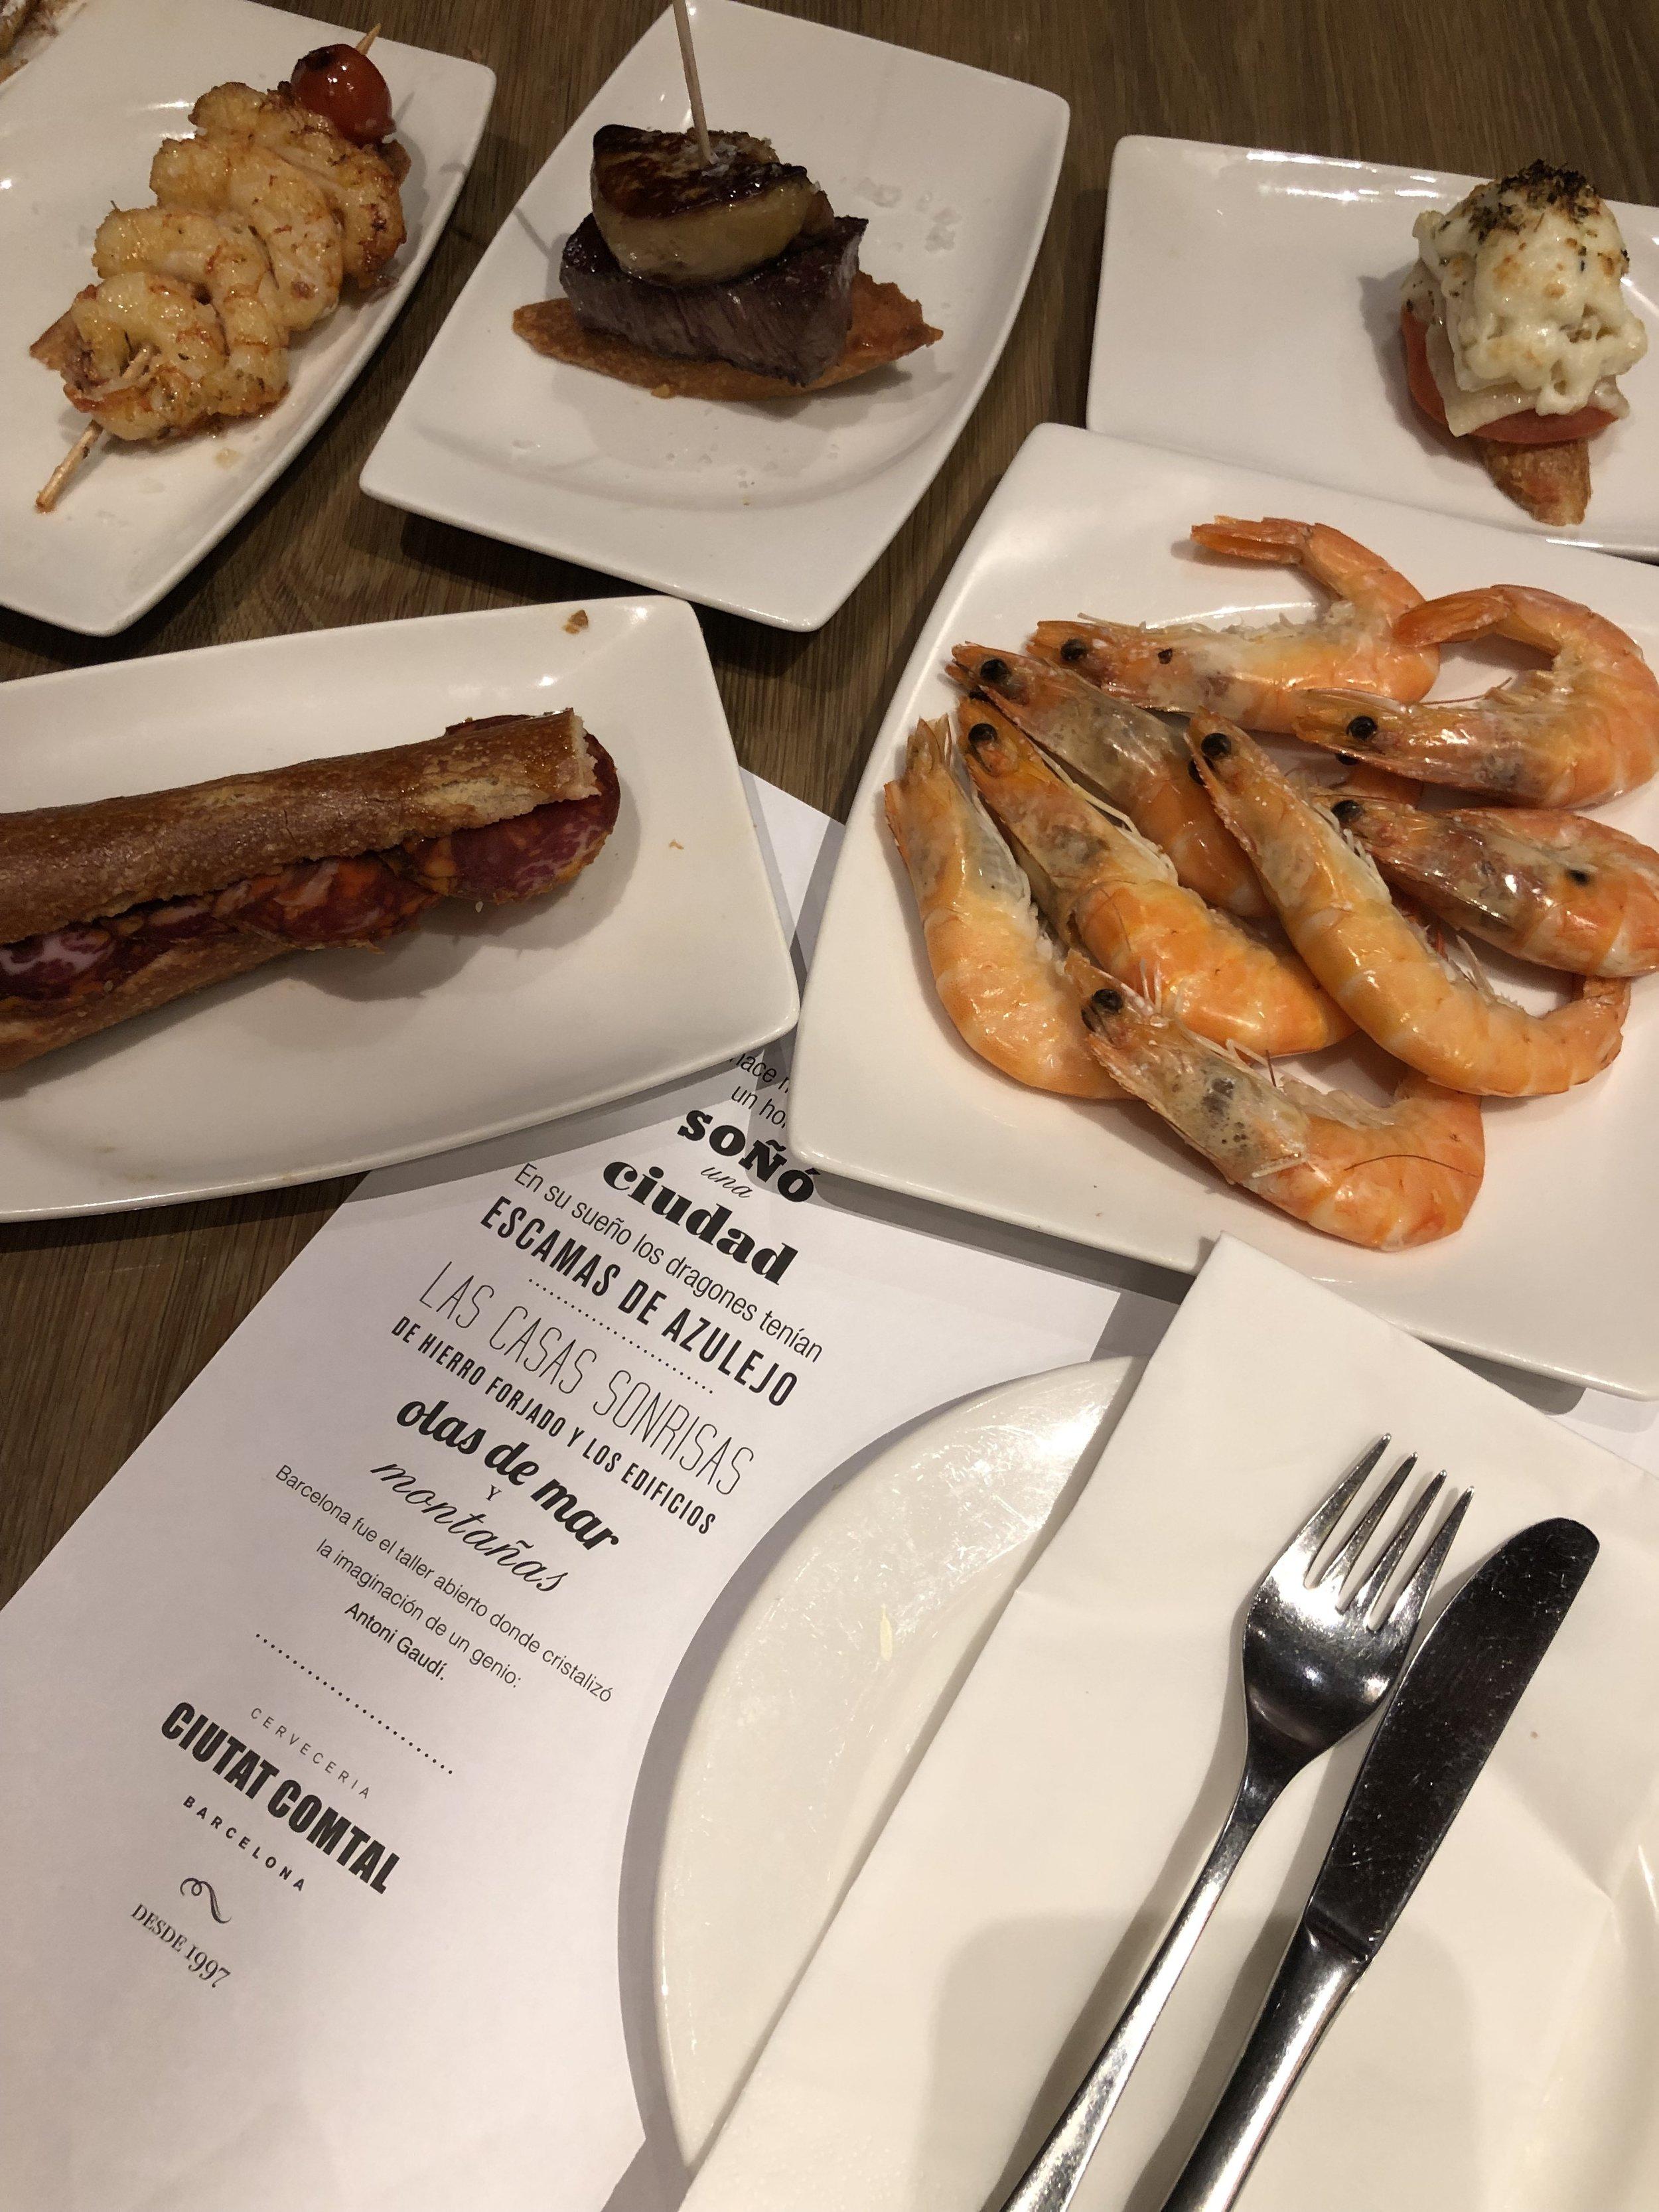 Eating in Barcelona on meethaha.com